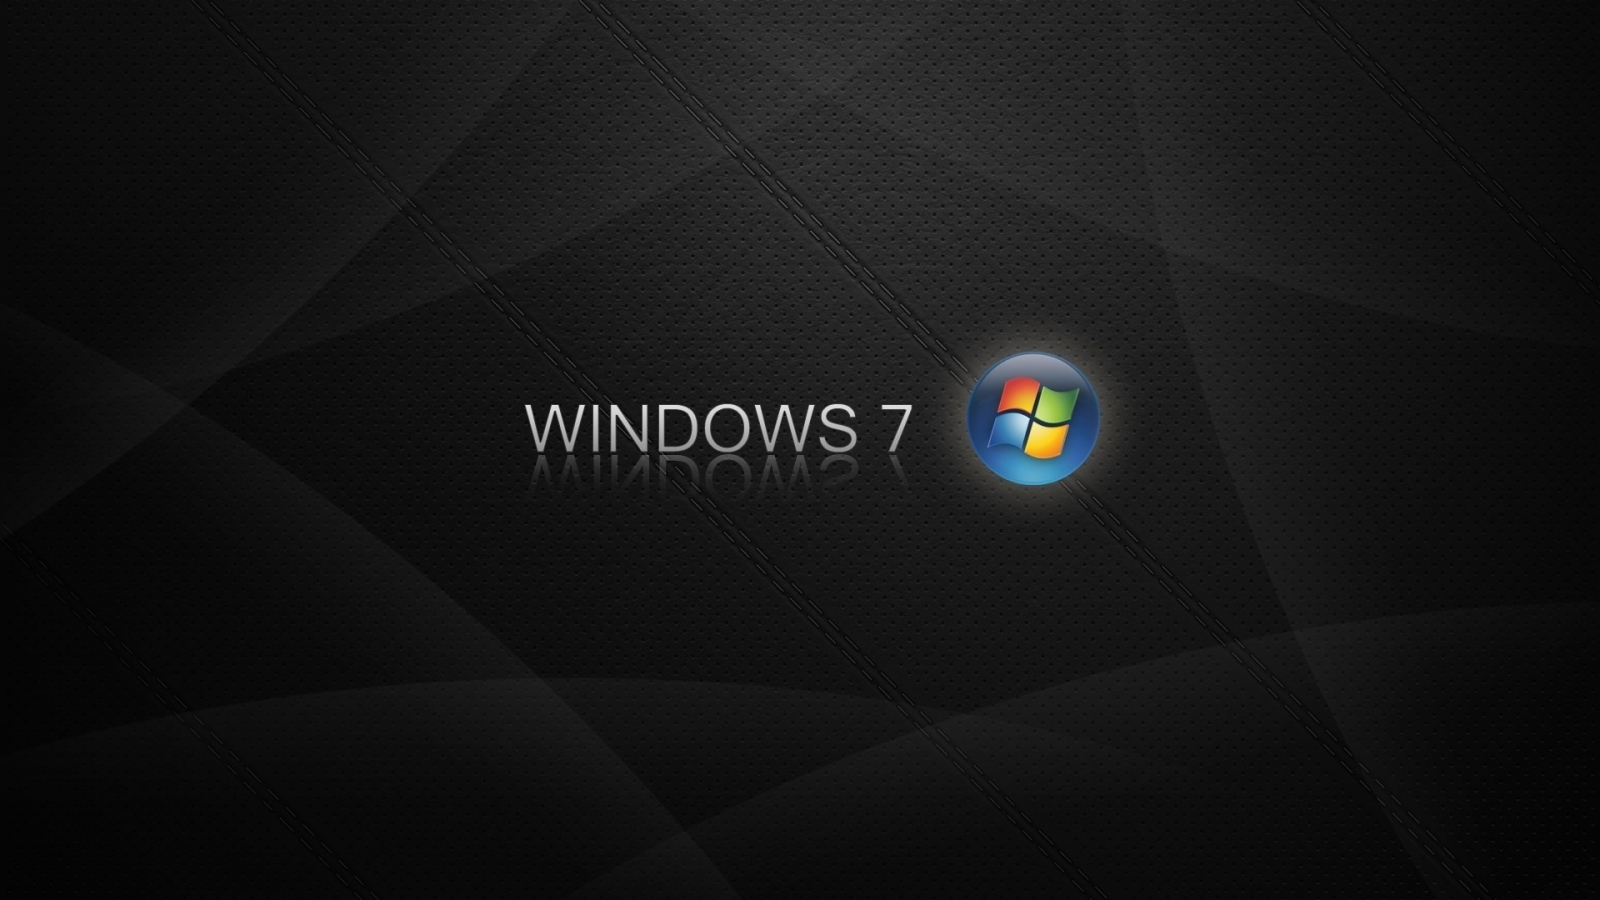 1600x900 Windows 7 Logo Blue Orange Black Wallpaper Background 1600x900